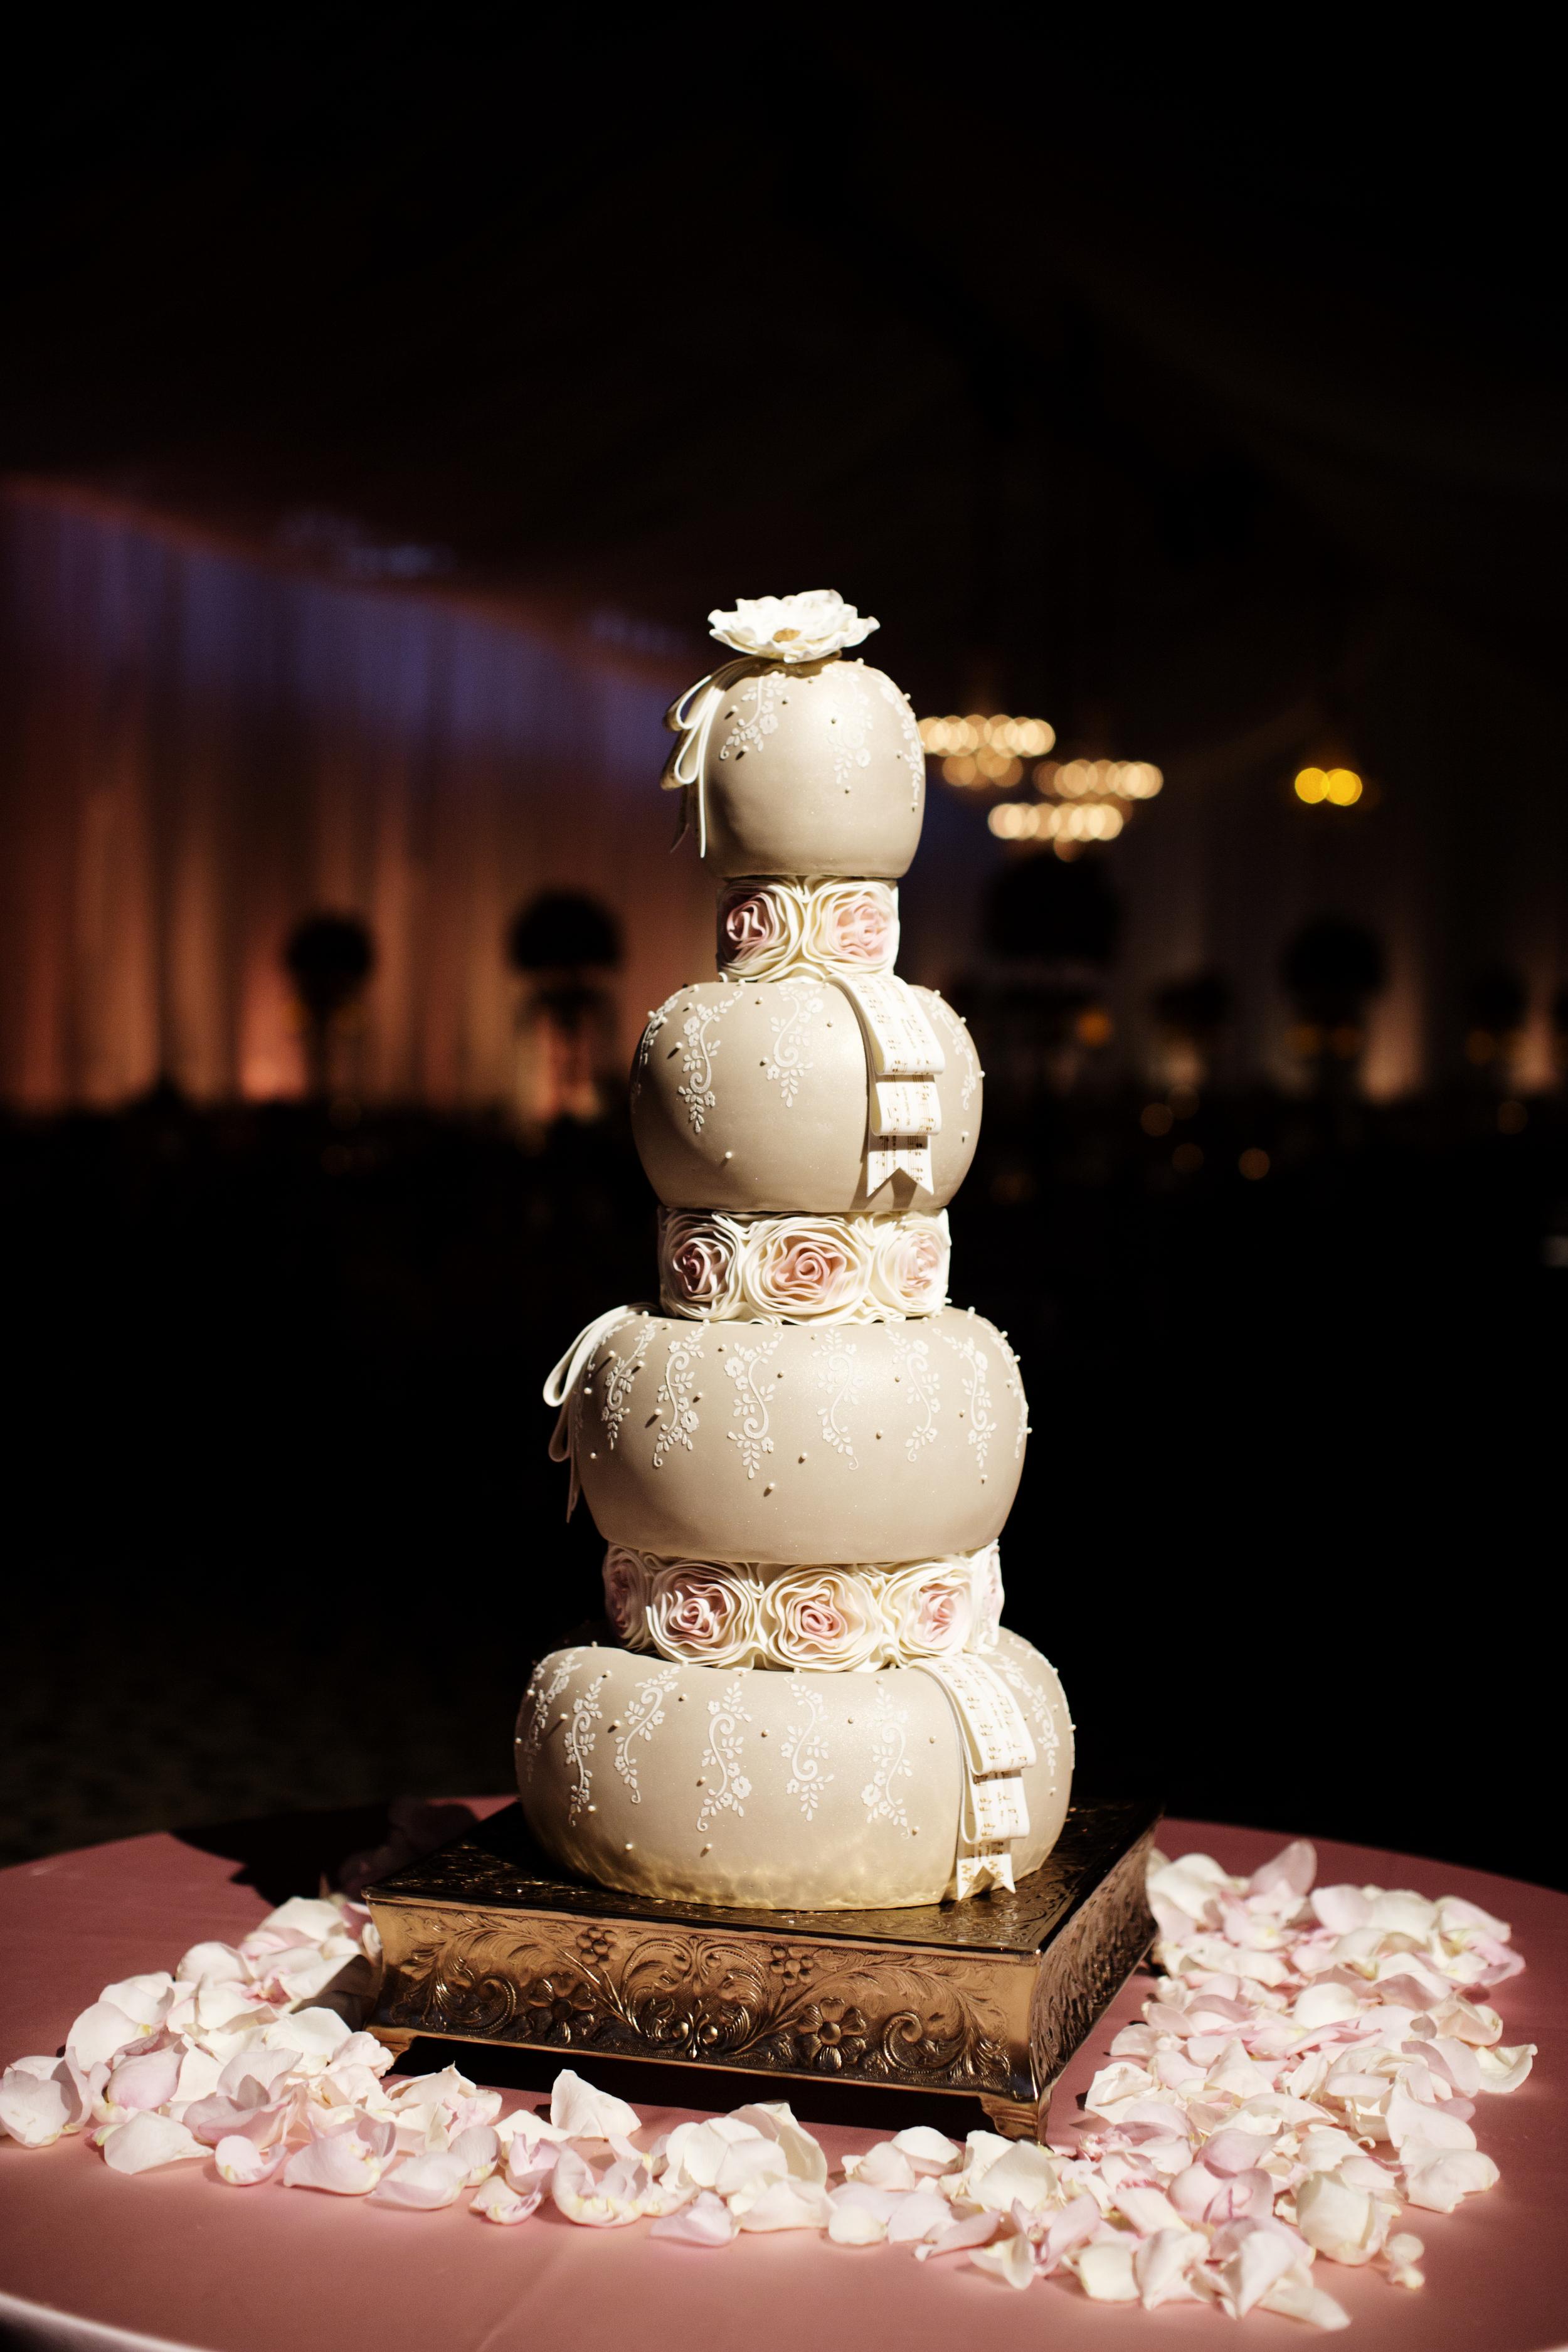 Ceci_New_York_Ceci_Style_Ceci_Johnson_Luxury_Lifestyle_Floral_Lace_Wedding_Letterpress_Inspiration_Design_Custom_Couture_Personalized_Invitations_122.JPG